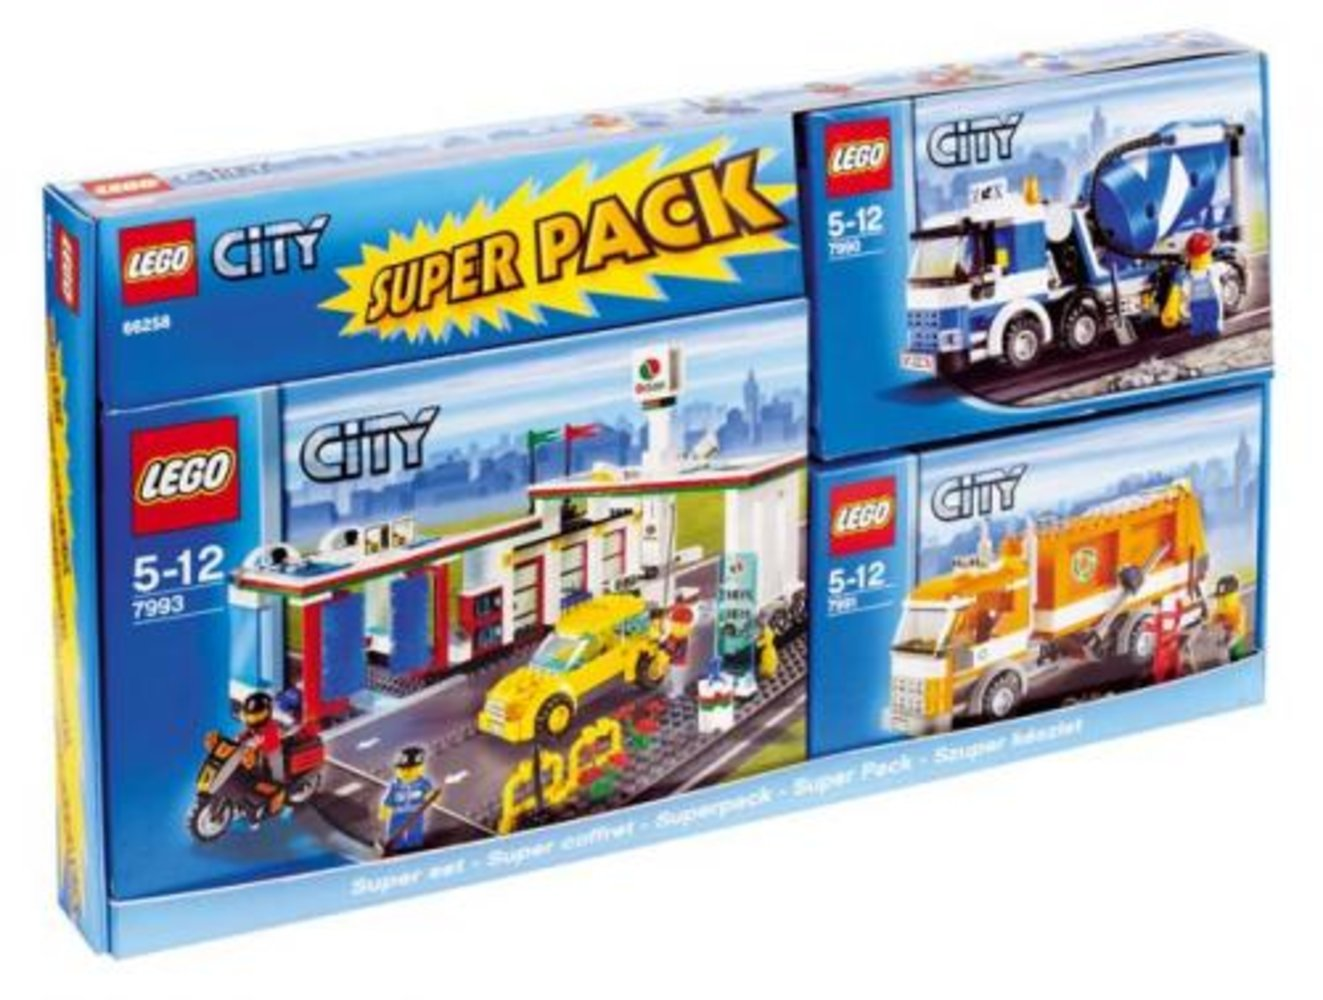 City Super Pack